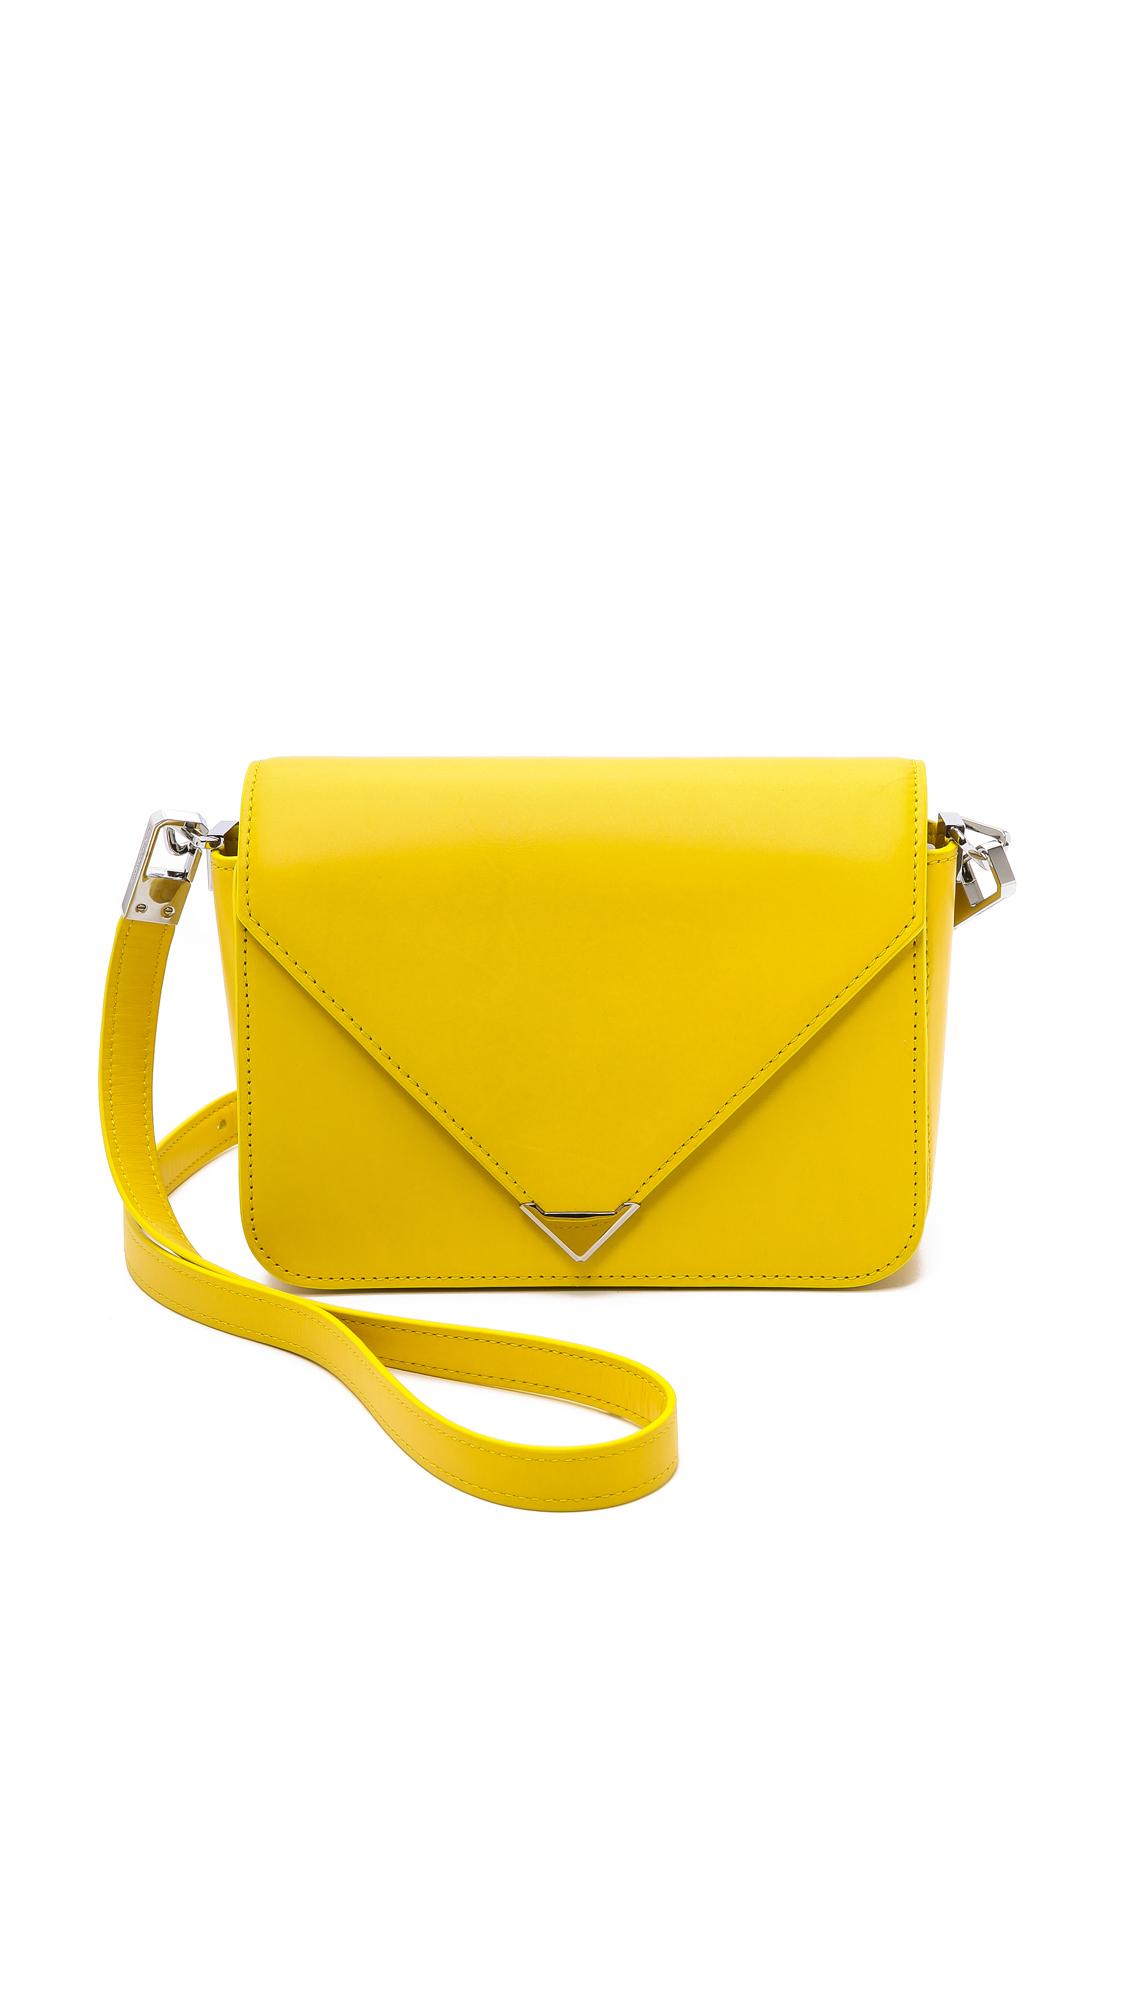 Alexander wang Prisma Envelope Small Sling Bag - Limonite in ...